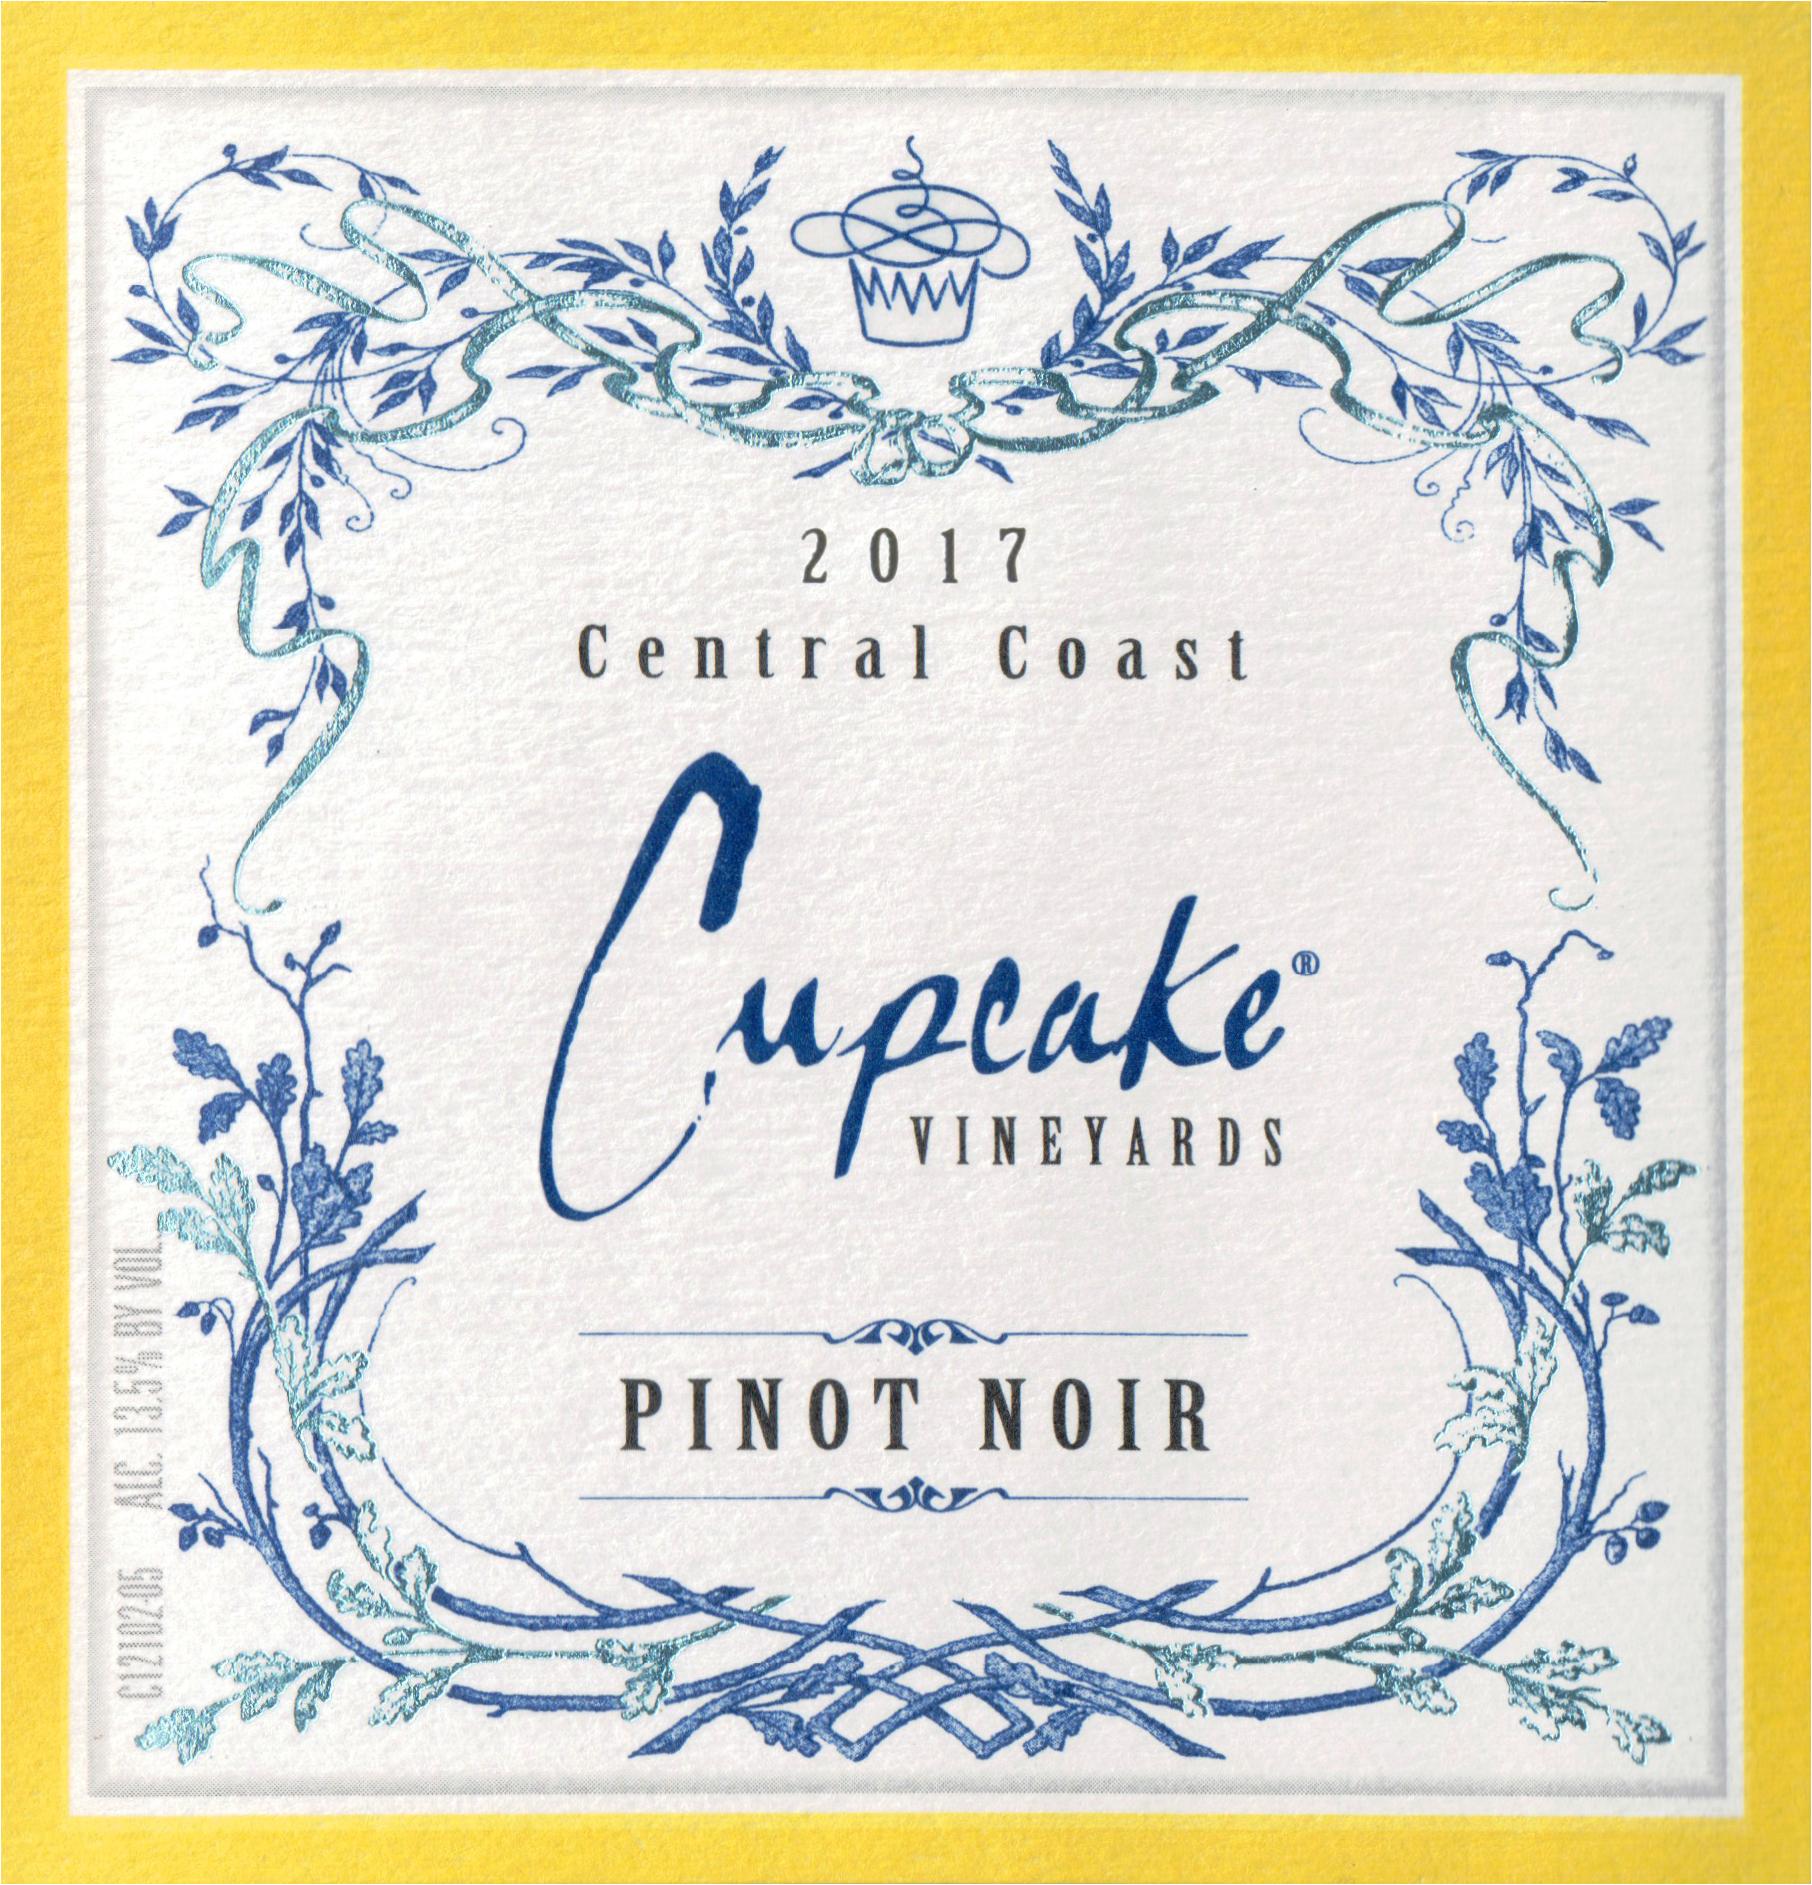 Cupcake Pinot Noir 2017